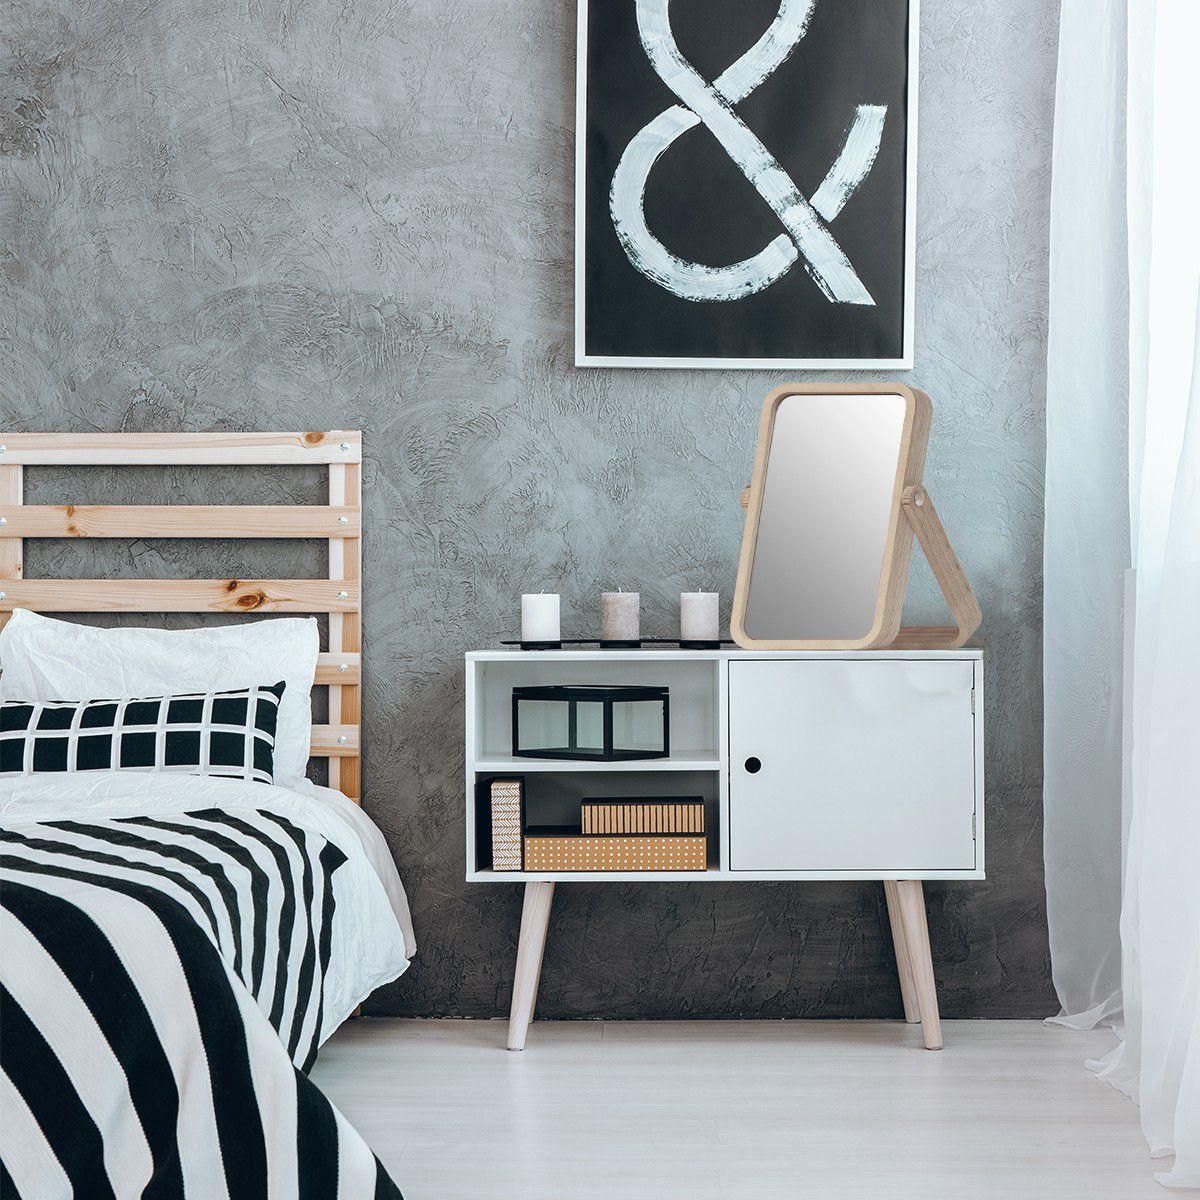 Multiply Furniture Table Top Vanity Mirror Buy Online In South - Bedroom furniture south africa online